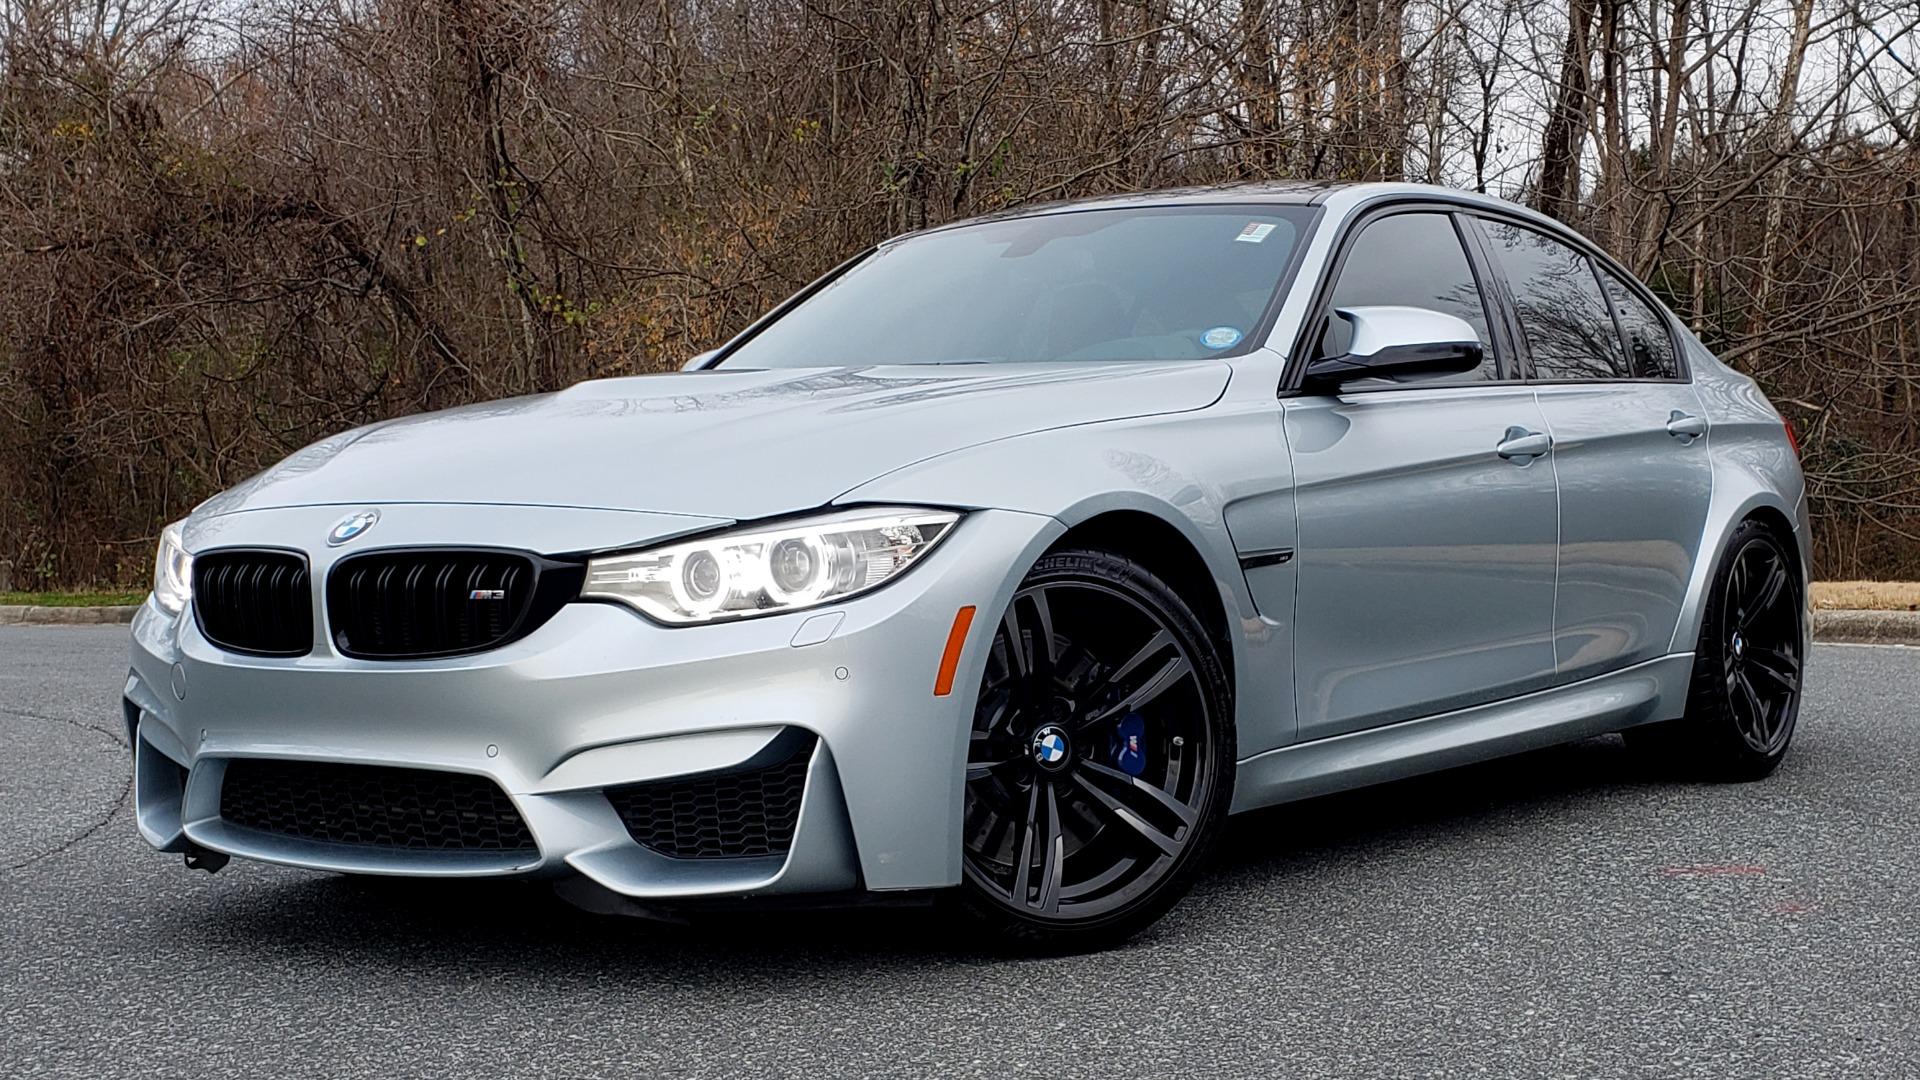 Used 2015 BMW M3 EXECUTIVE PKG / NAV / CAMERA / HUD / CARBON FIBER ROOF for sale Sold at Formula Imports in Charlotte NC 28227 20